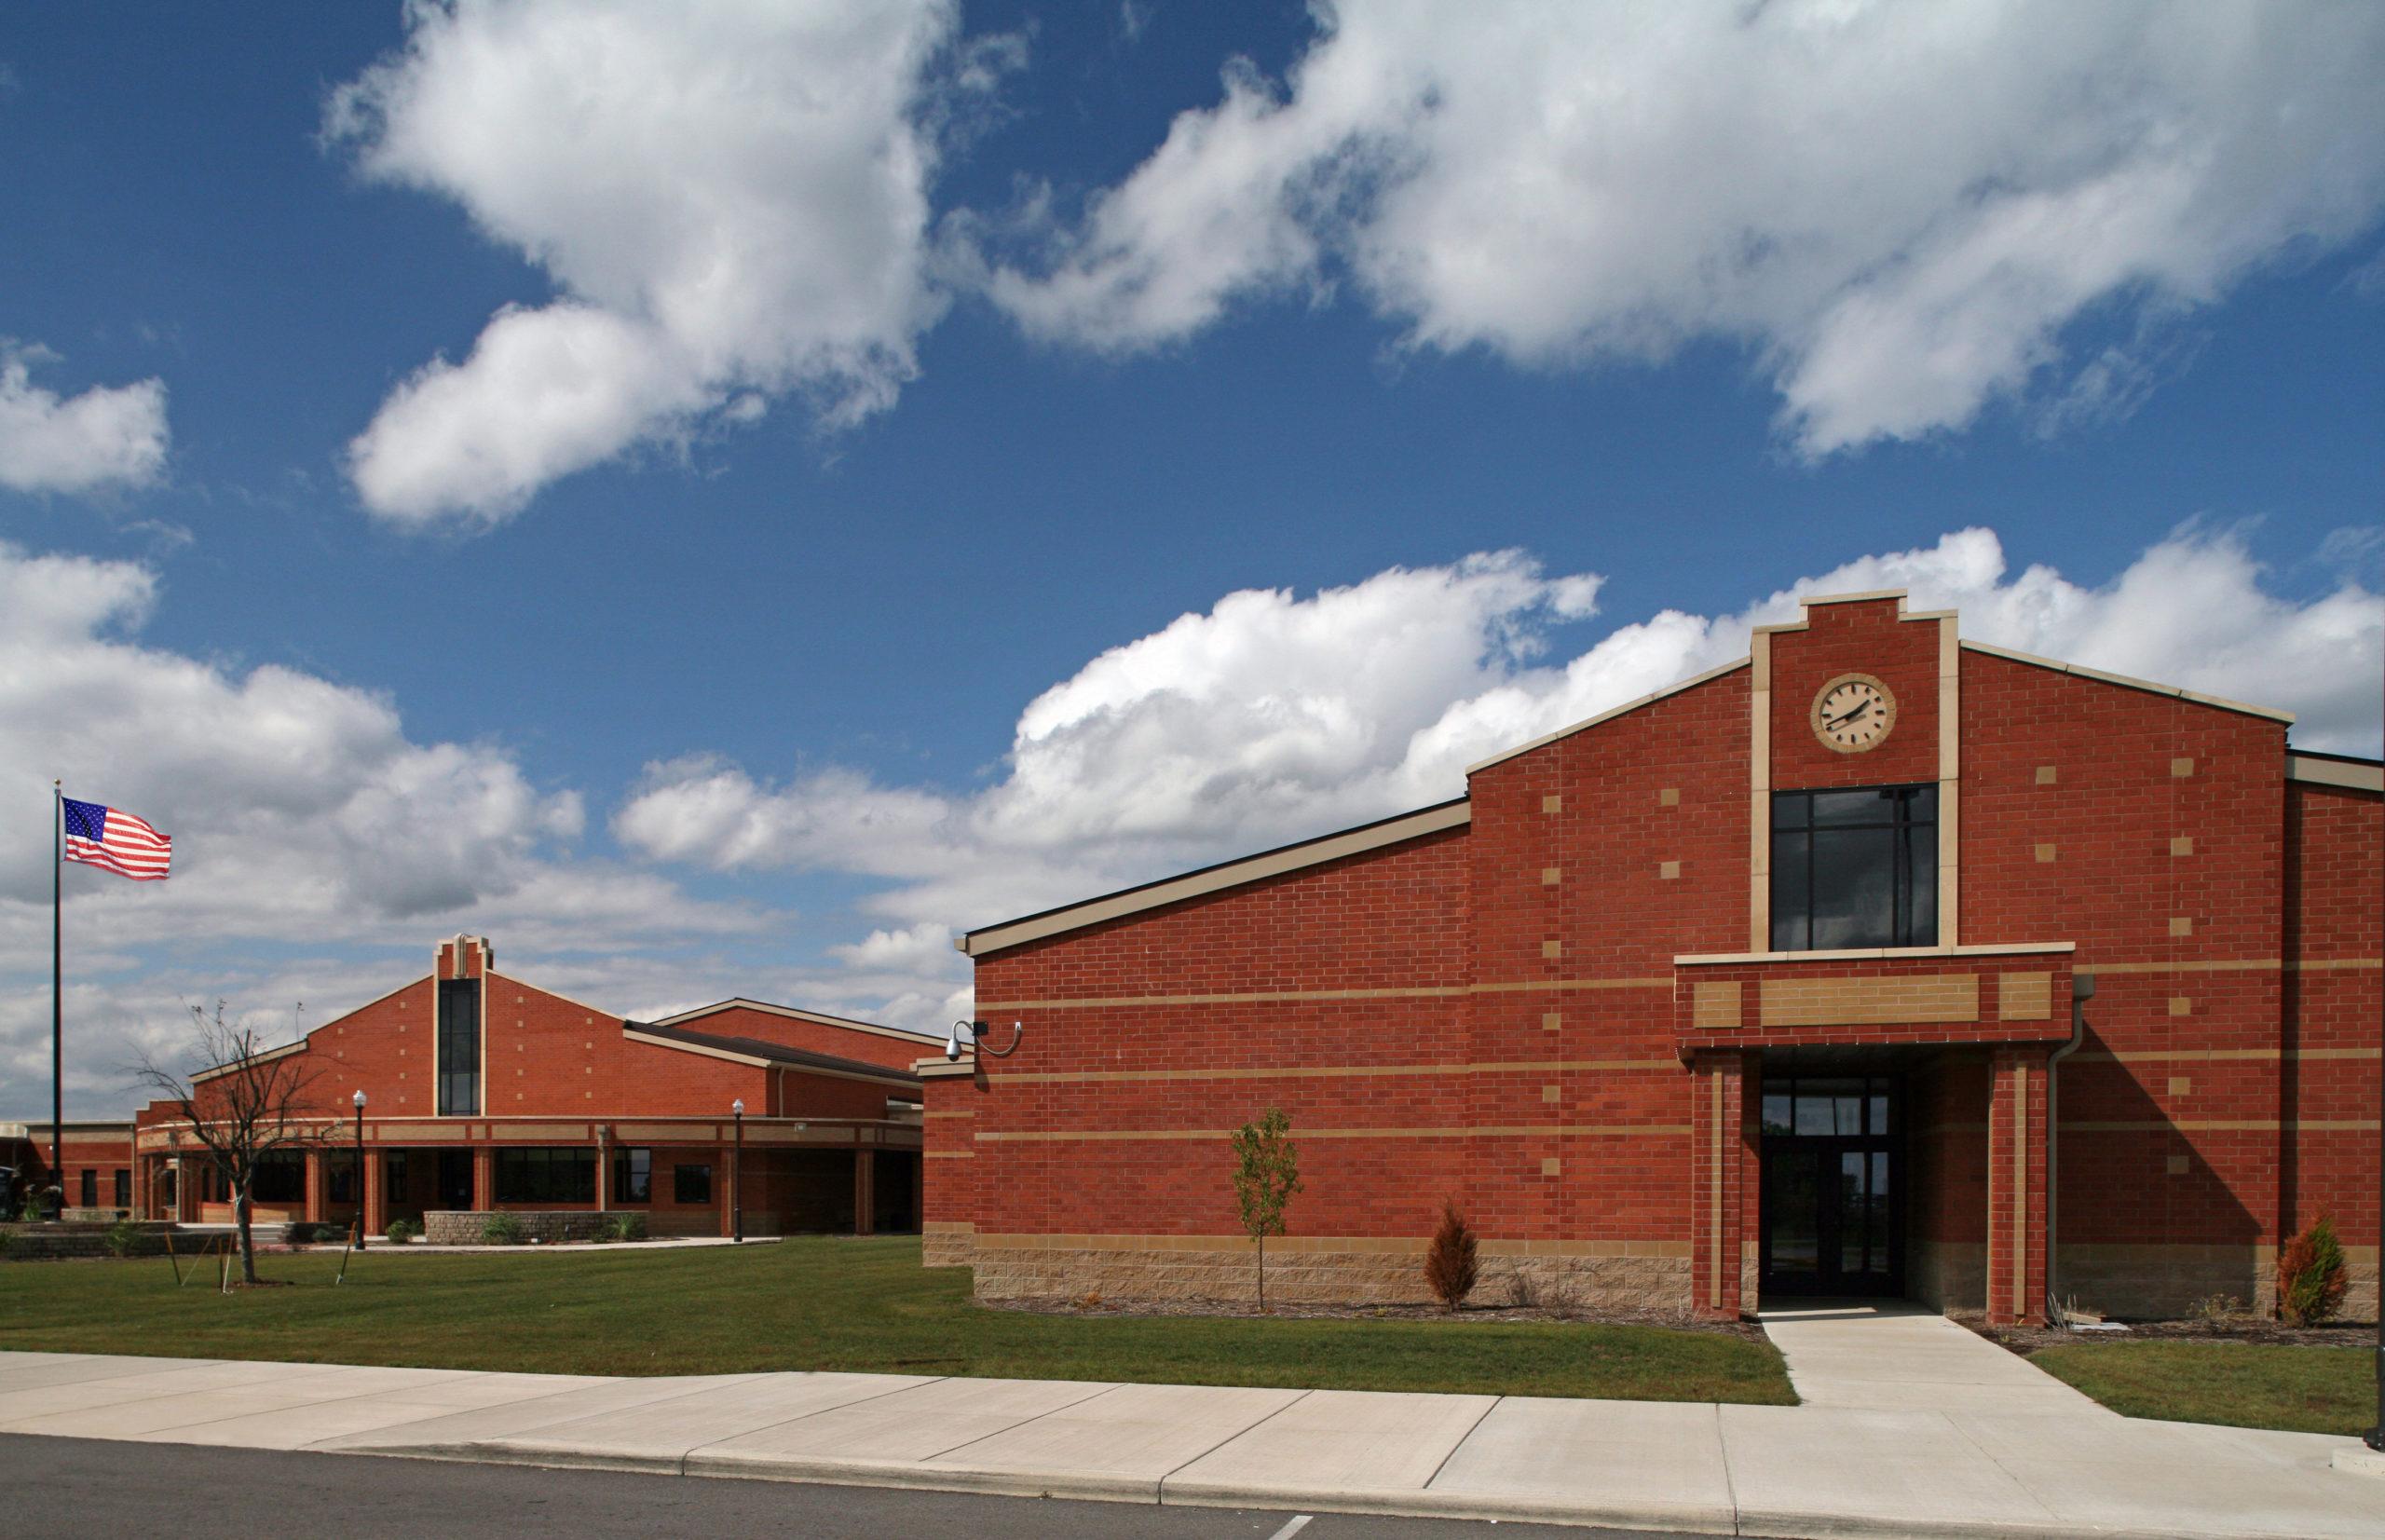 Defiance Elementary School